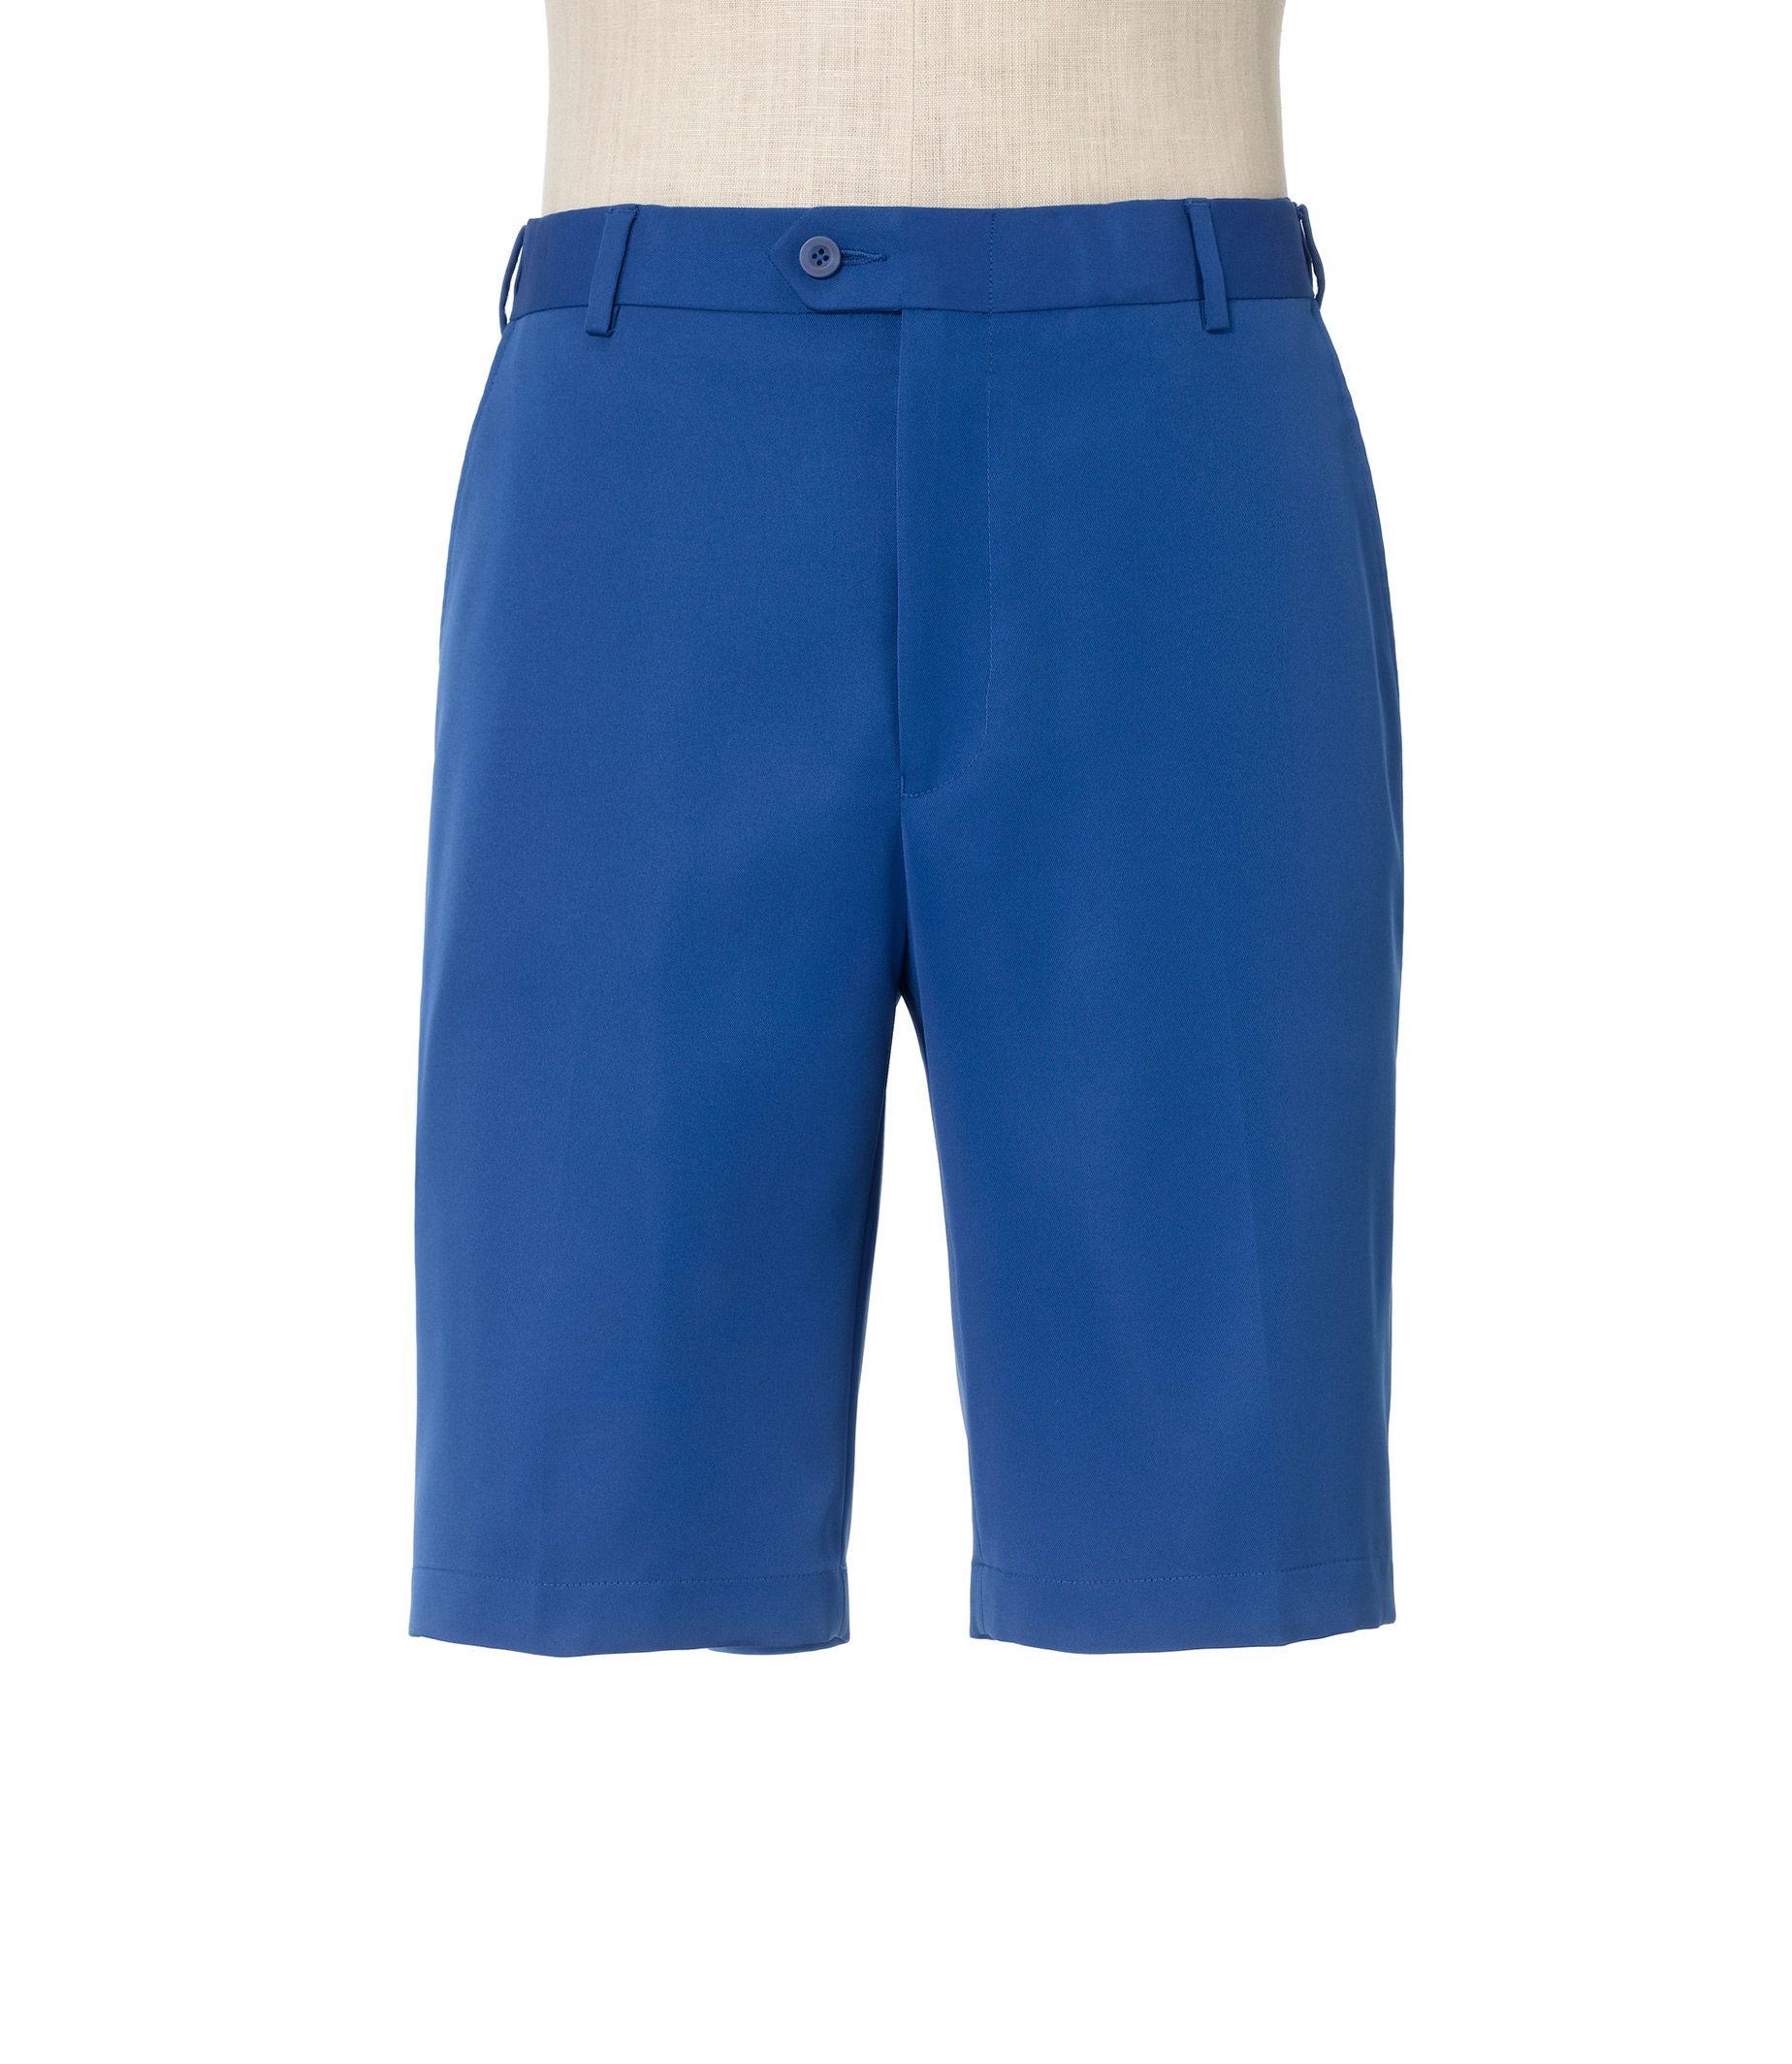 David Leadbetter Plain Front Tailored Fit Performance Shorts